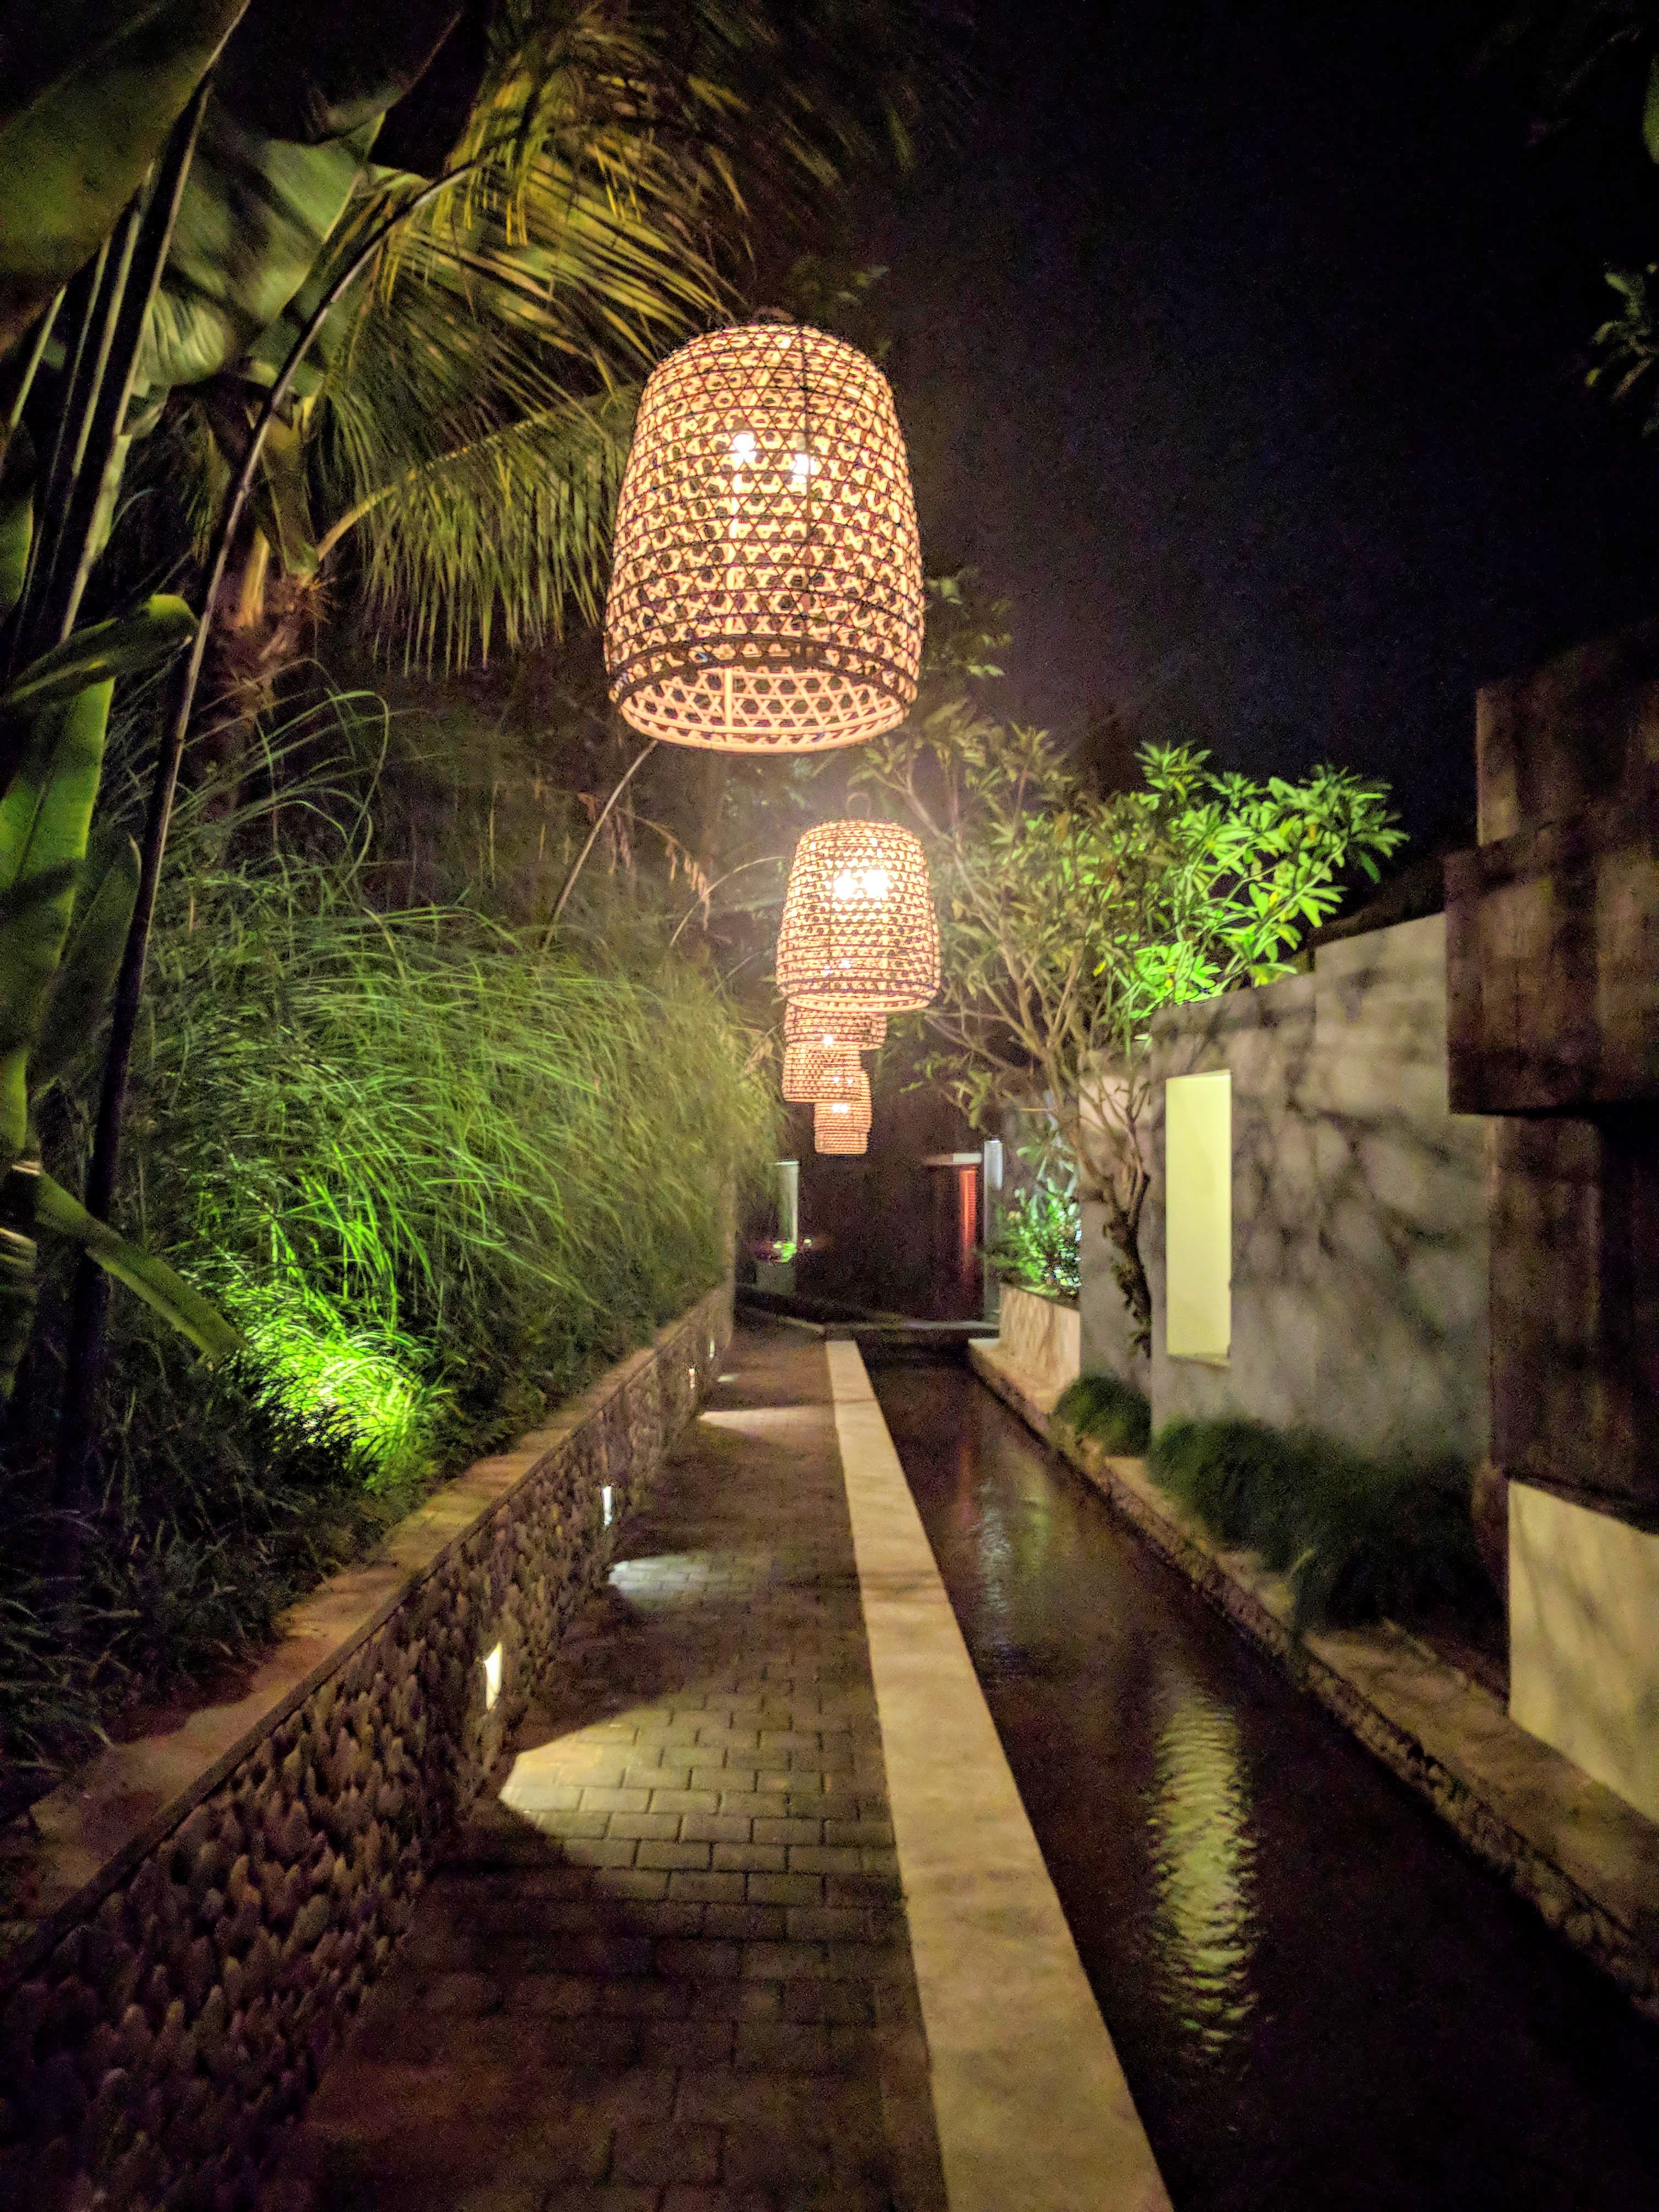 Pathway to the Bamboo Villa at night